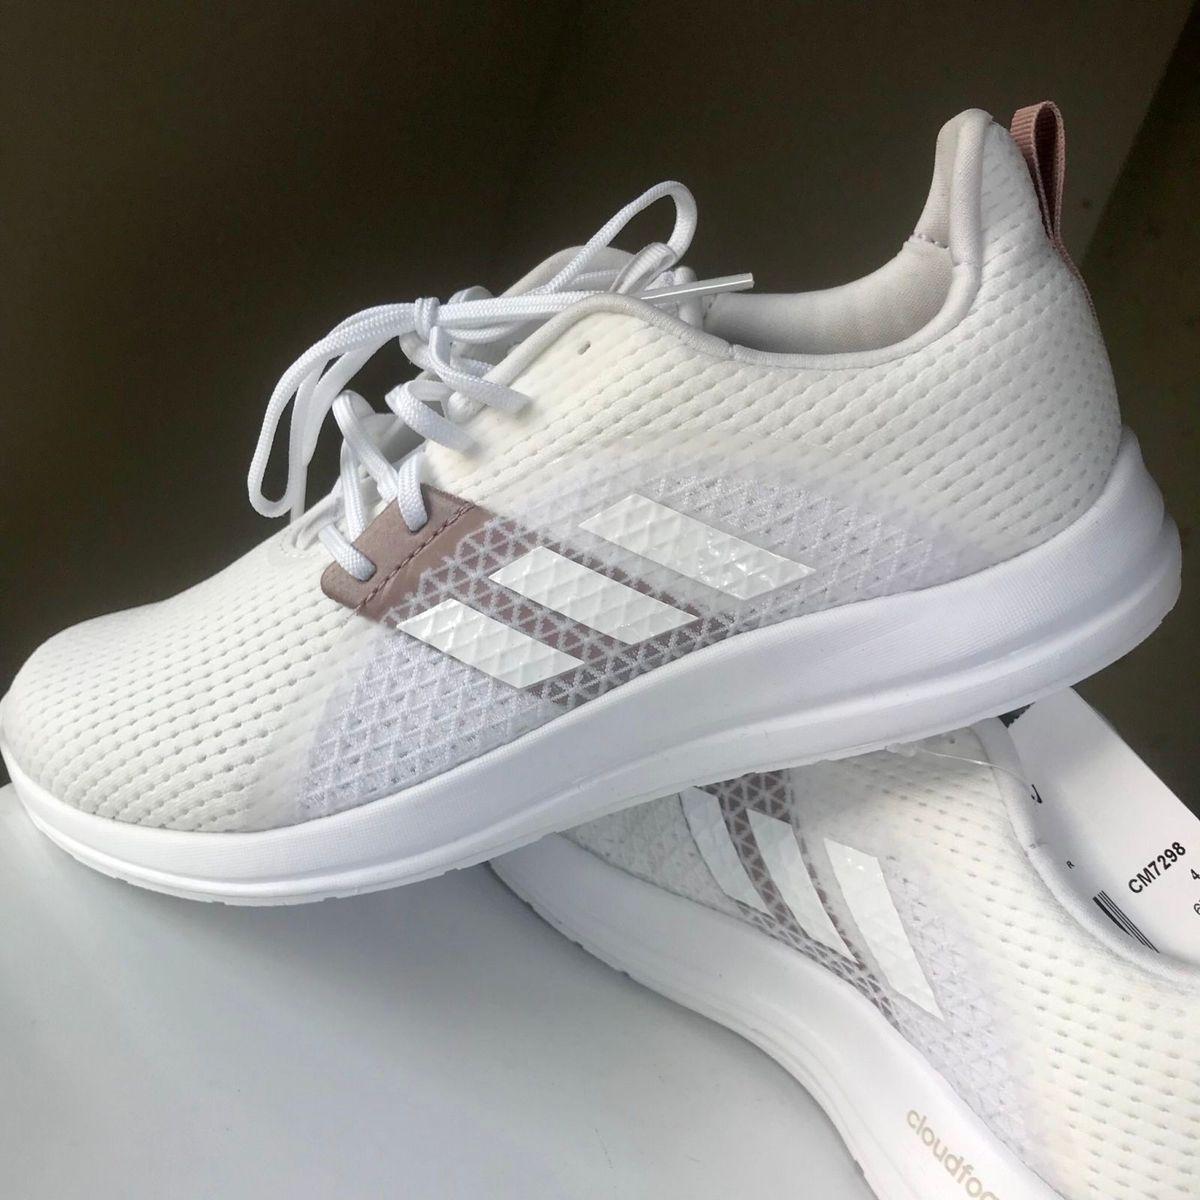 814f1910fe adidas element v - tênis adidas.  Czm6ly9wag90b3muzw5qb2vplmnvbs5ici9wcm9kdwn0cy82ntgwntivyjnhnzq4mmrjngfhyzjky2zkm2exzthjmtm2nza5ndiuanbn  ...